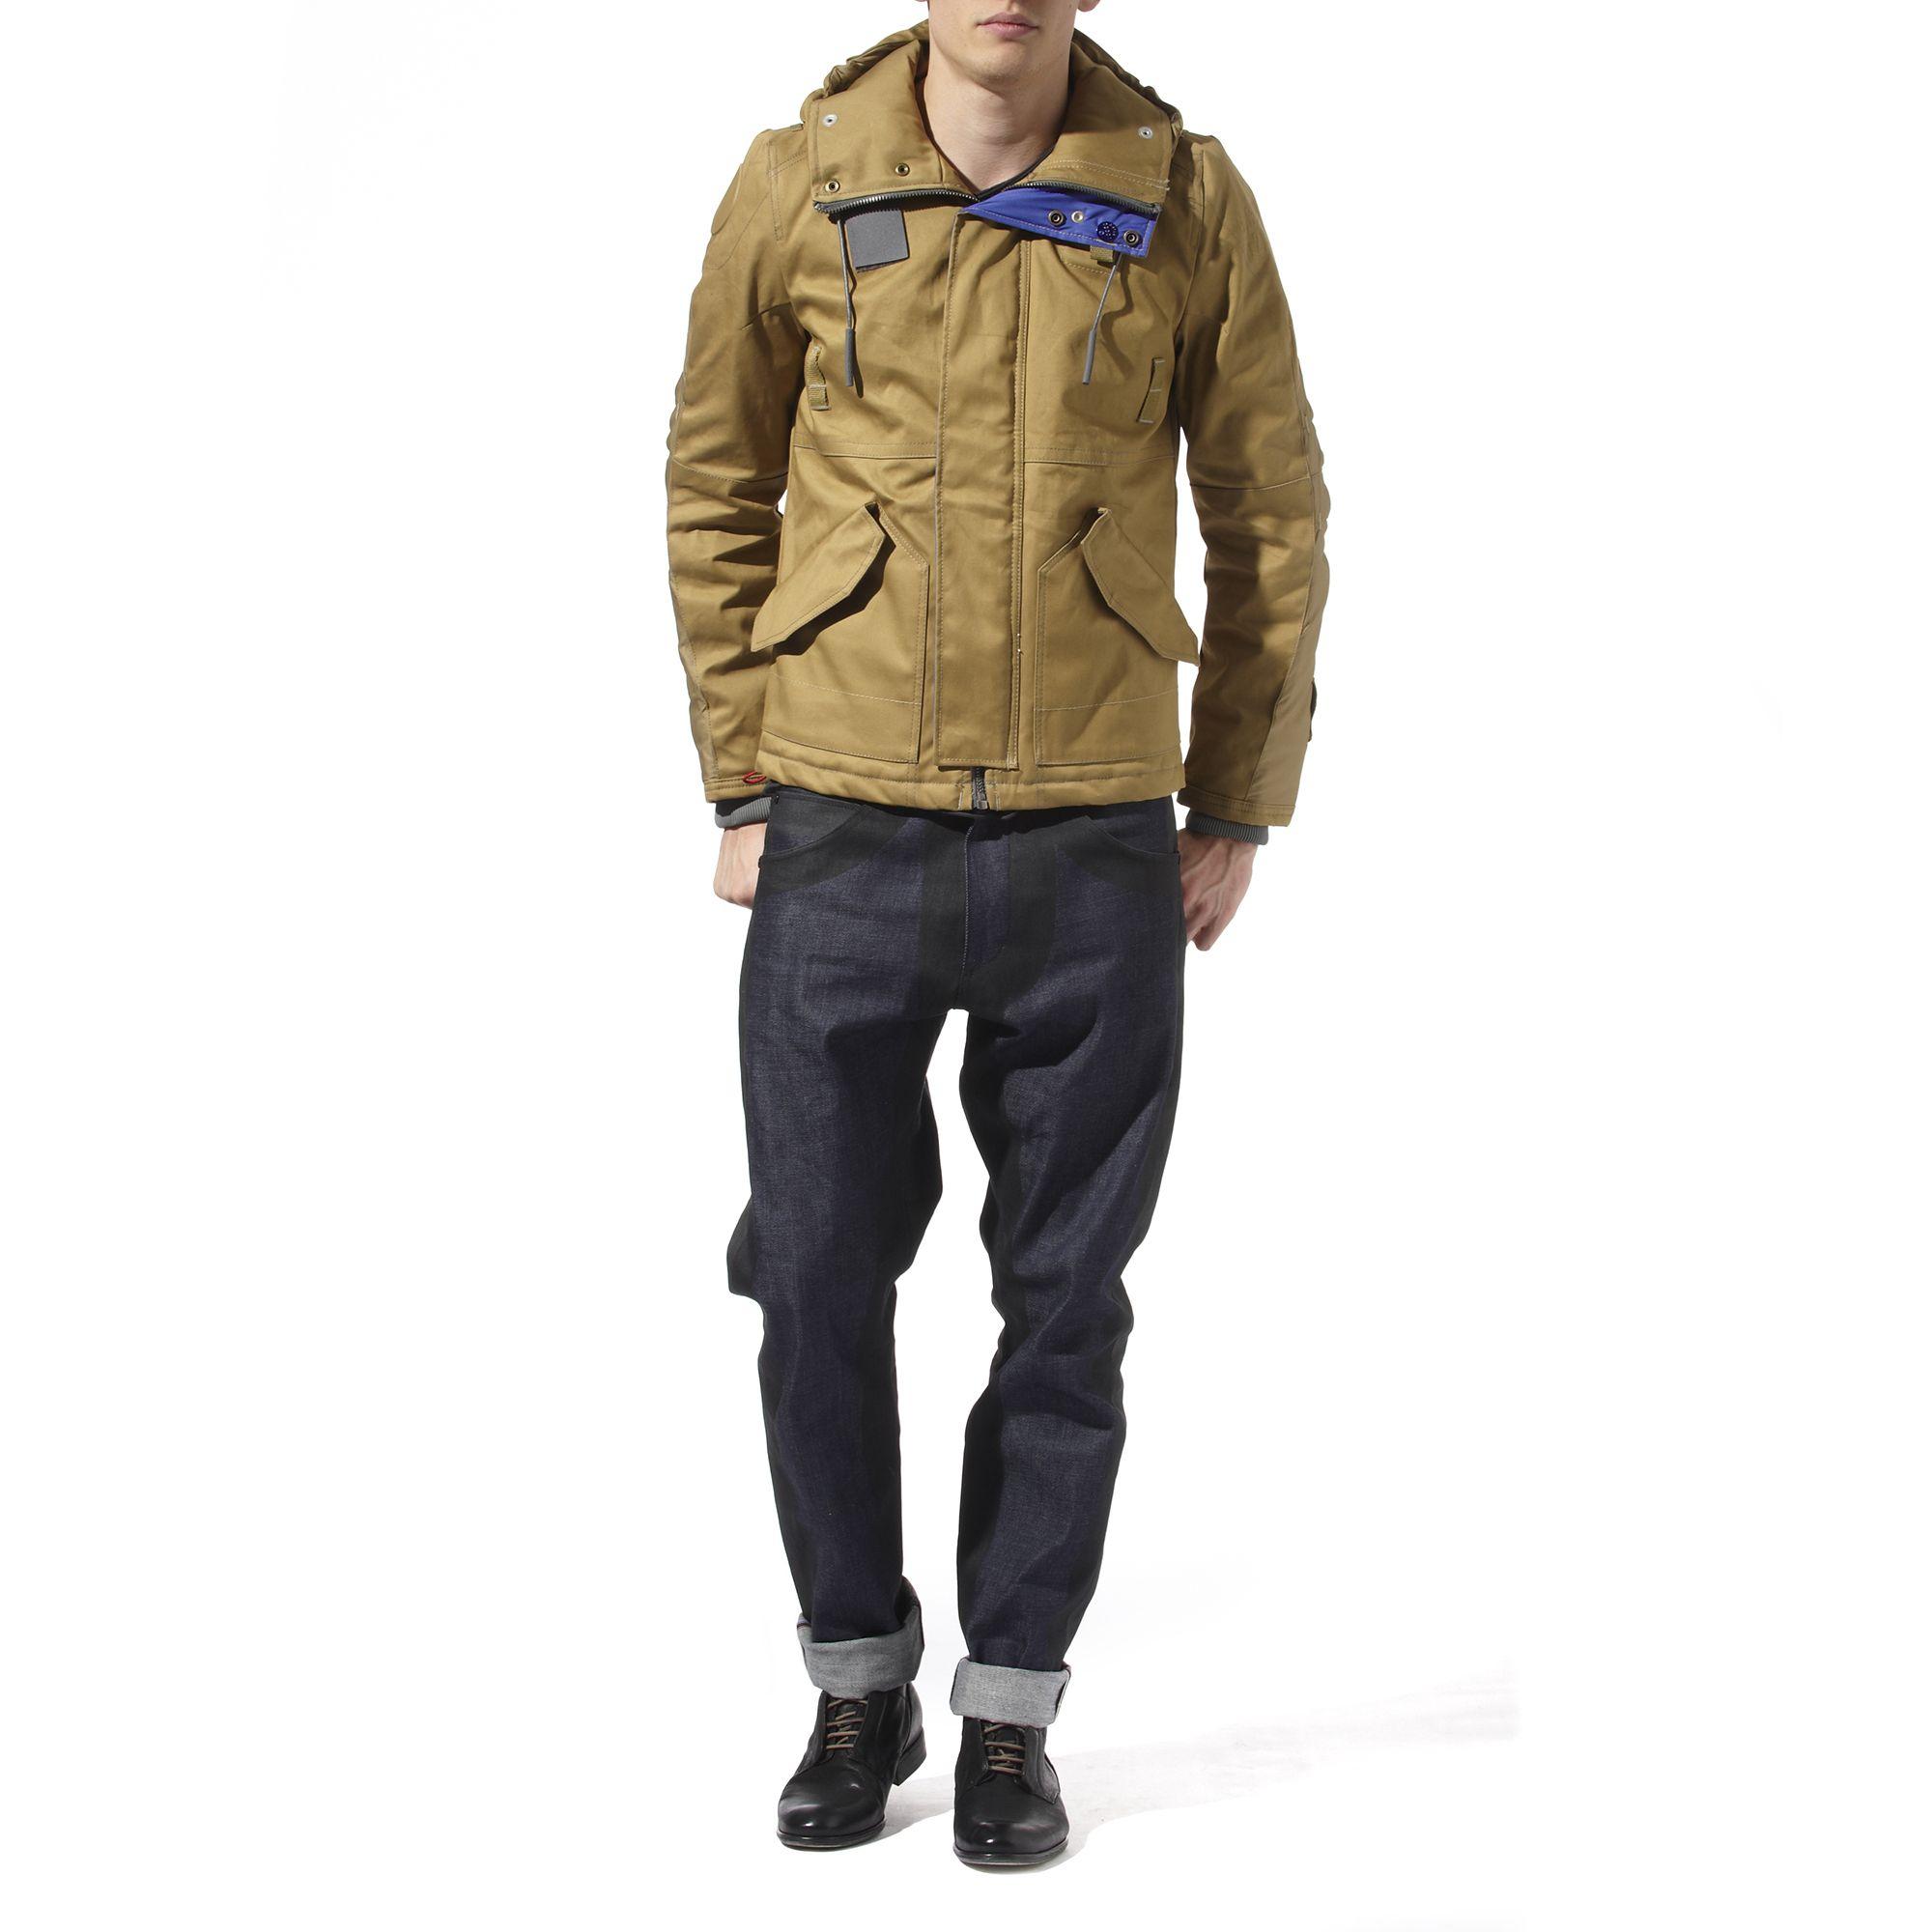 g star raw aero parka jacket in natural for men lyst. Black Bedroom Furniture Sets. Home Design Ideas